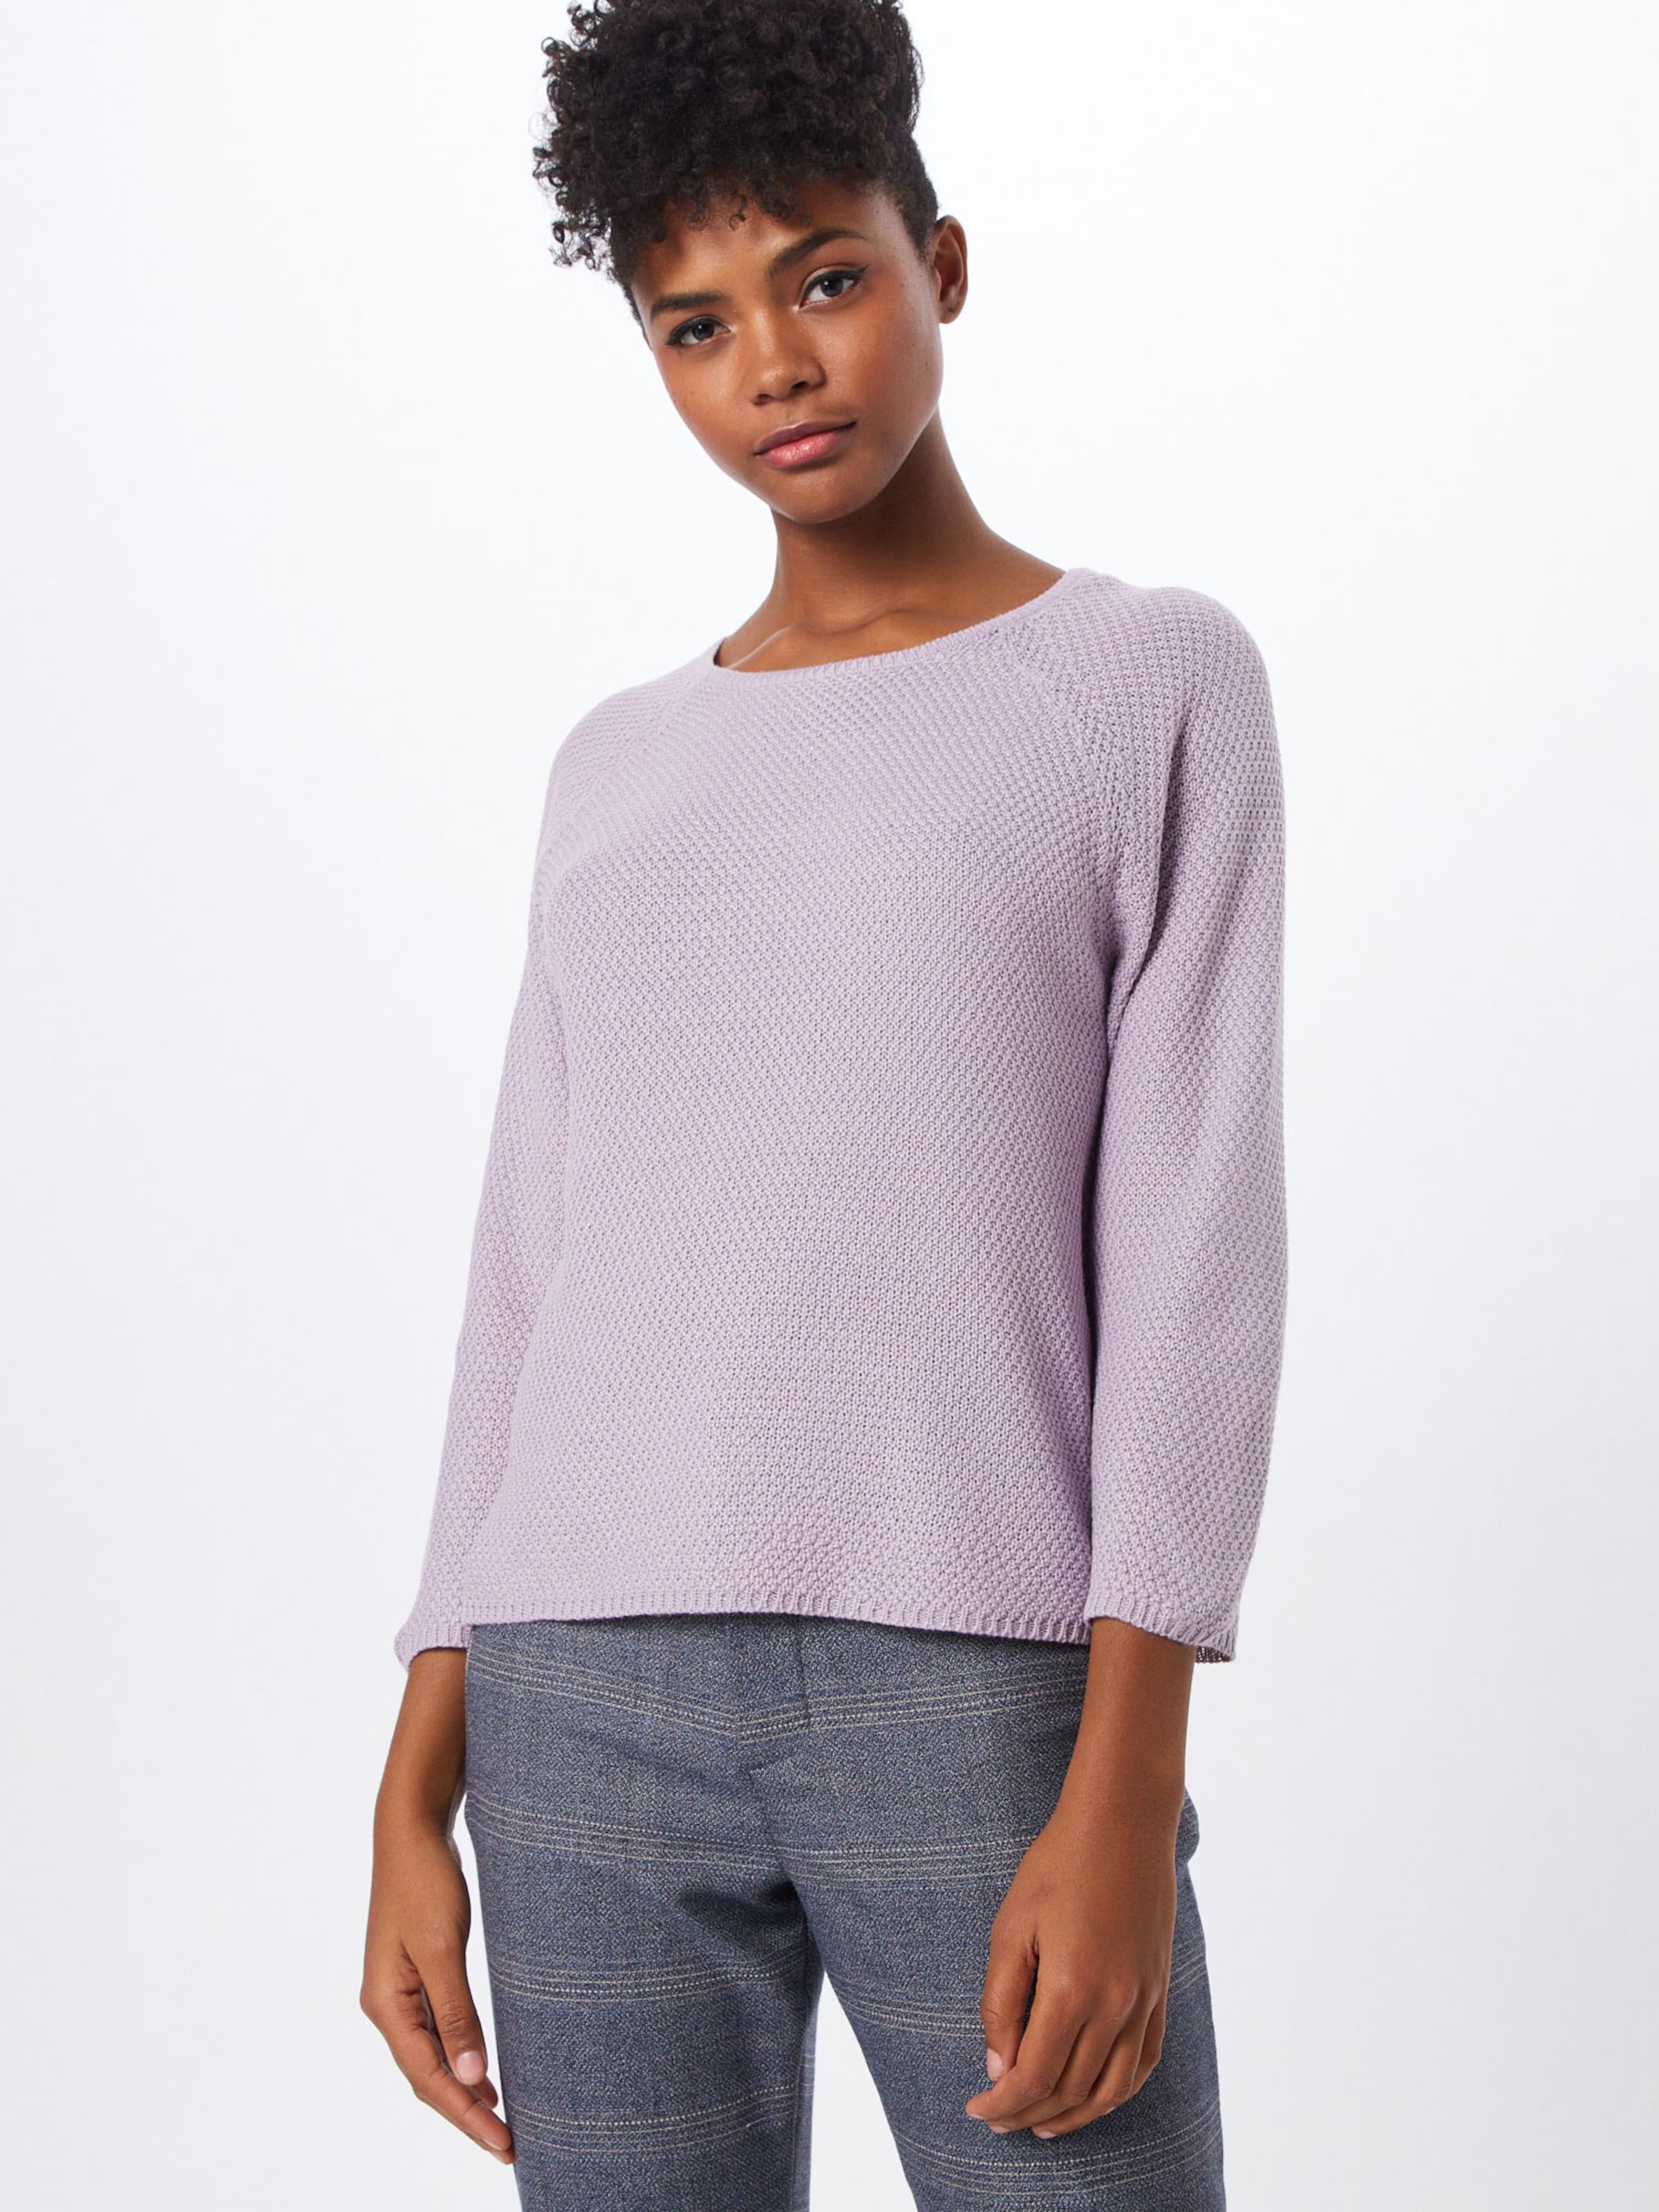 Lavendel Jacqueline Pullover In De Yong 'dante' vn0wNm8O